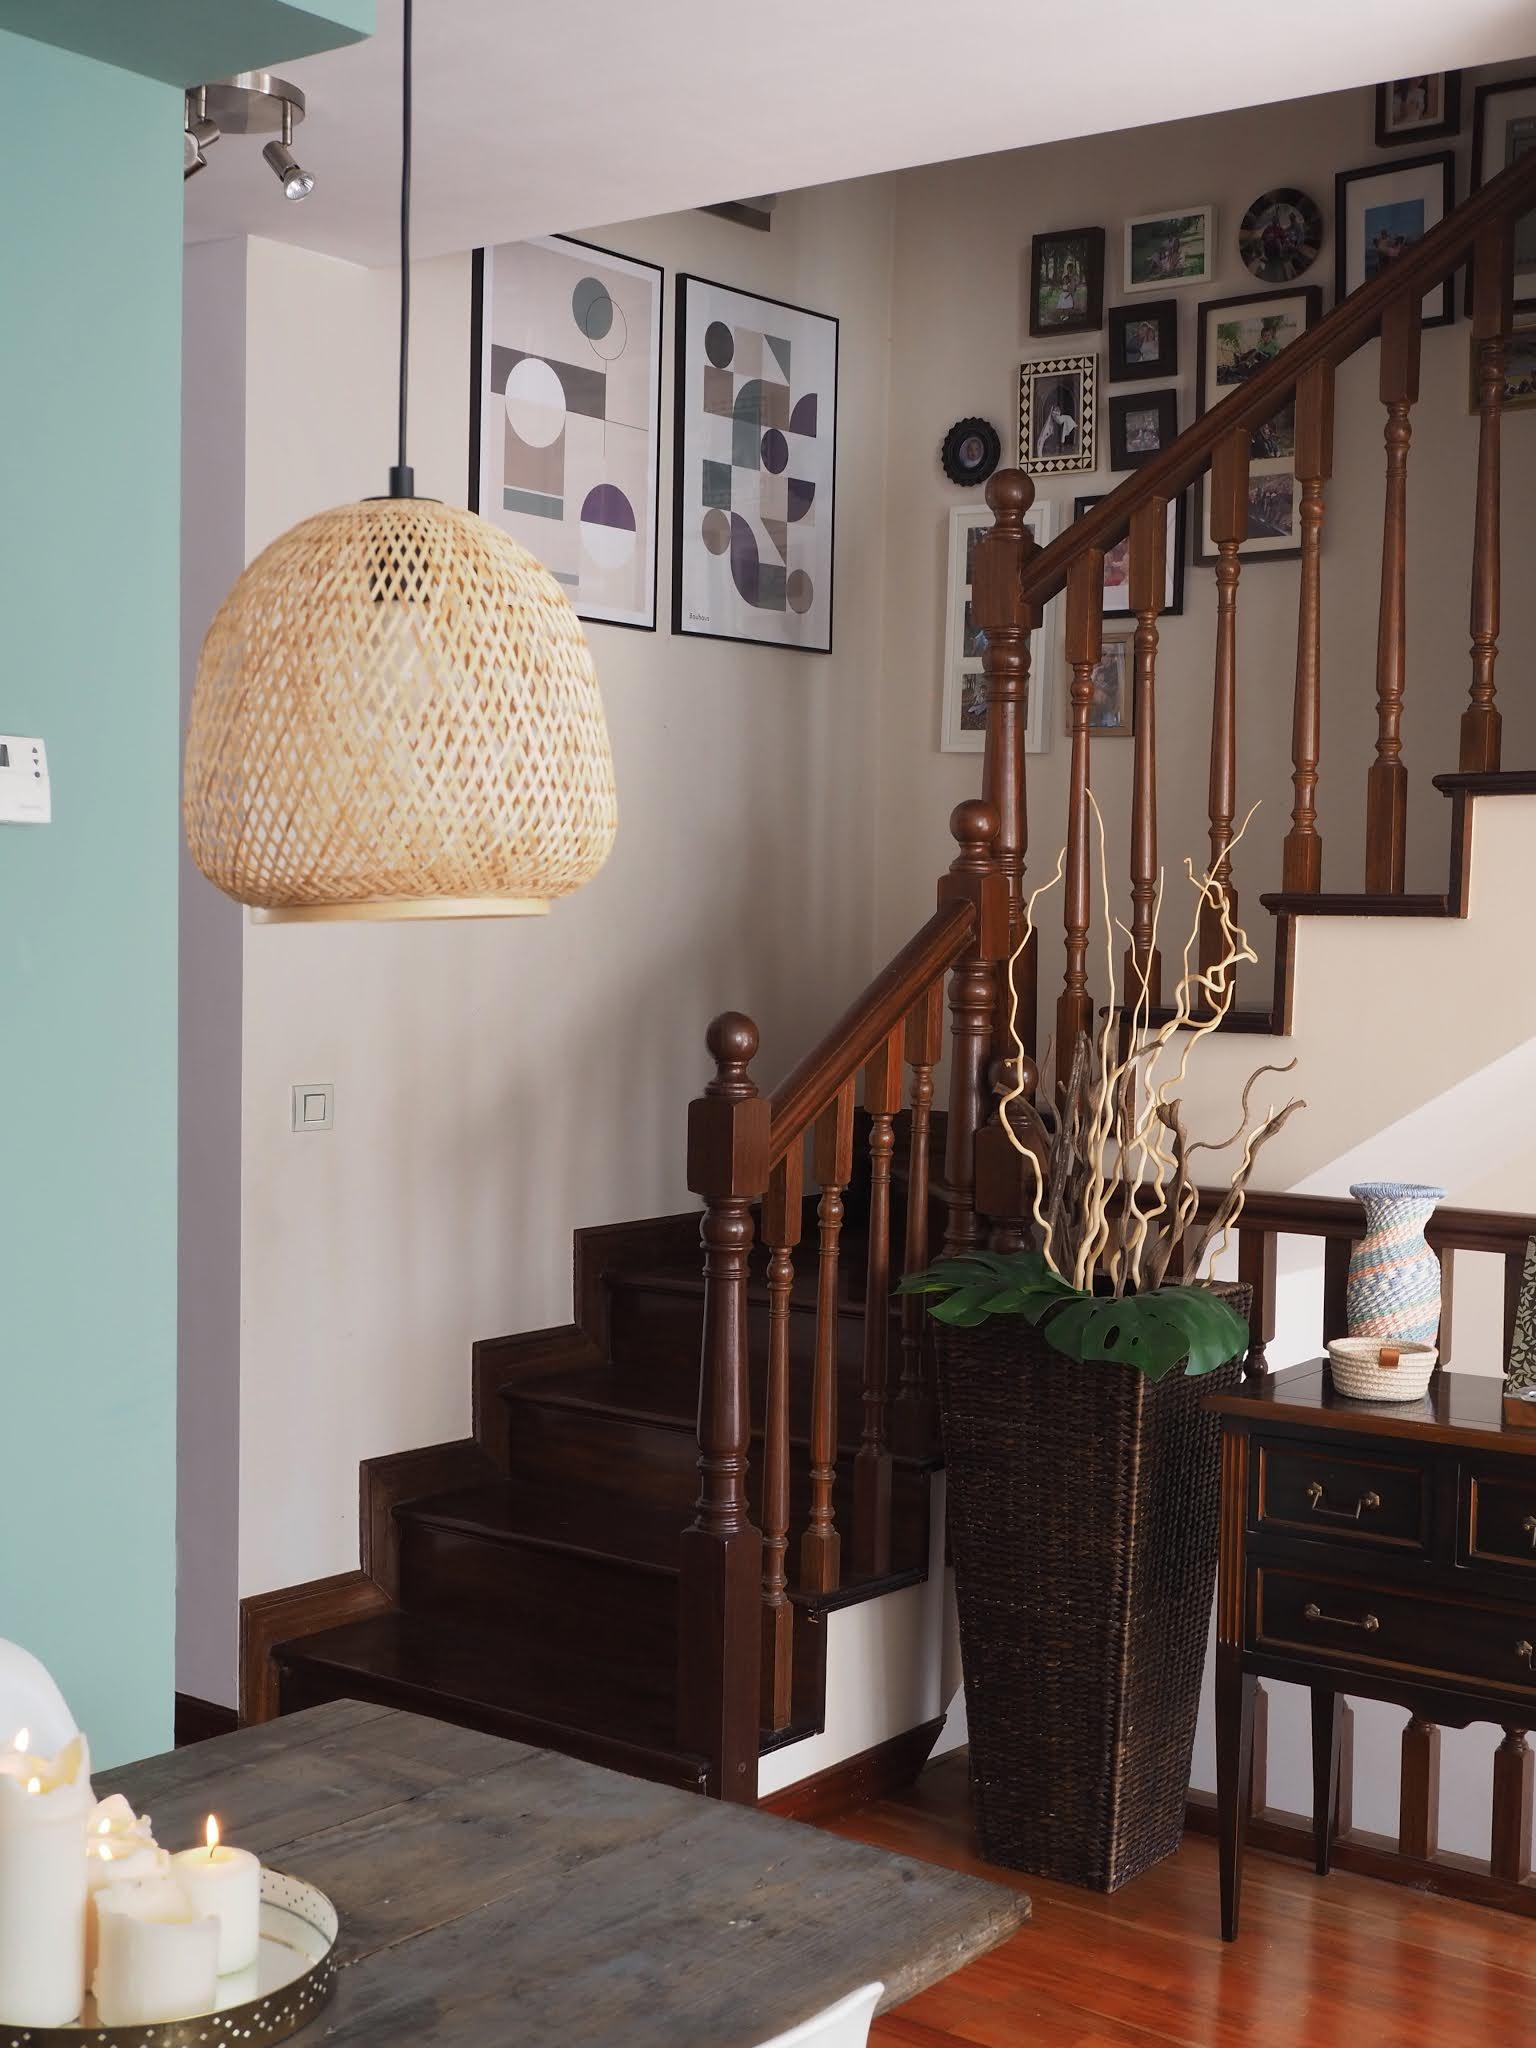 4 trucos para decorar de forma coherente vuestro hogar_3